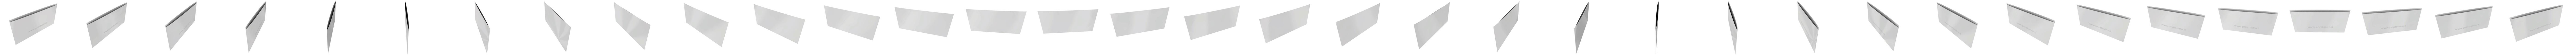 Vokas / įmautė – kirtiklio Nr. 710